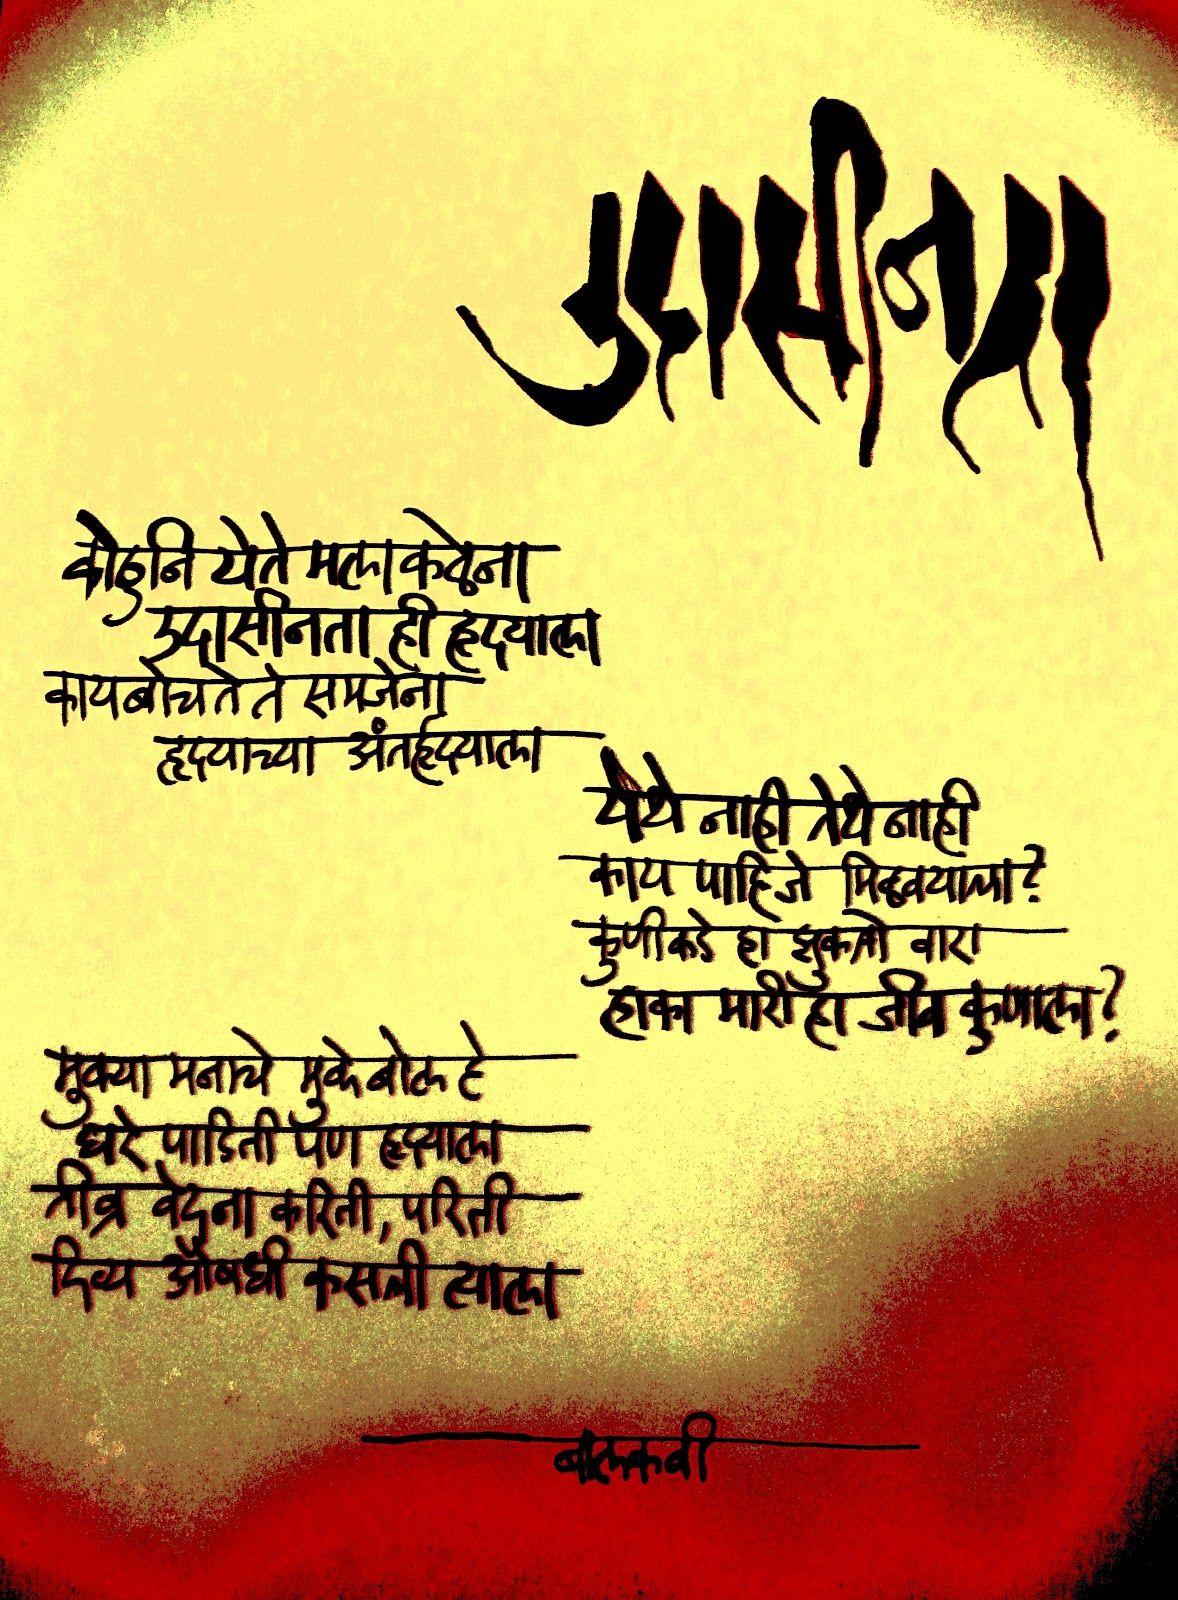 Marathi Poems Marathi poems, Writing poems, Poems